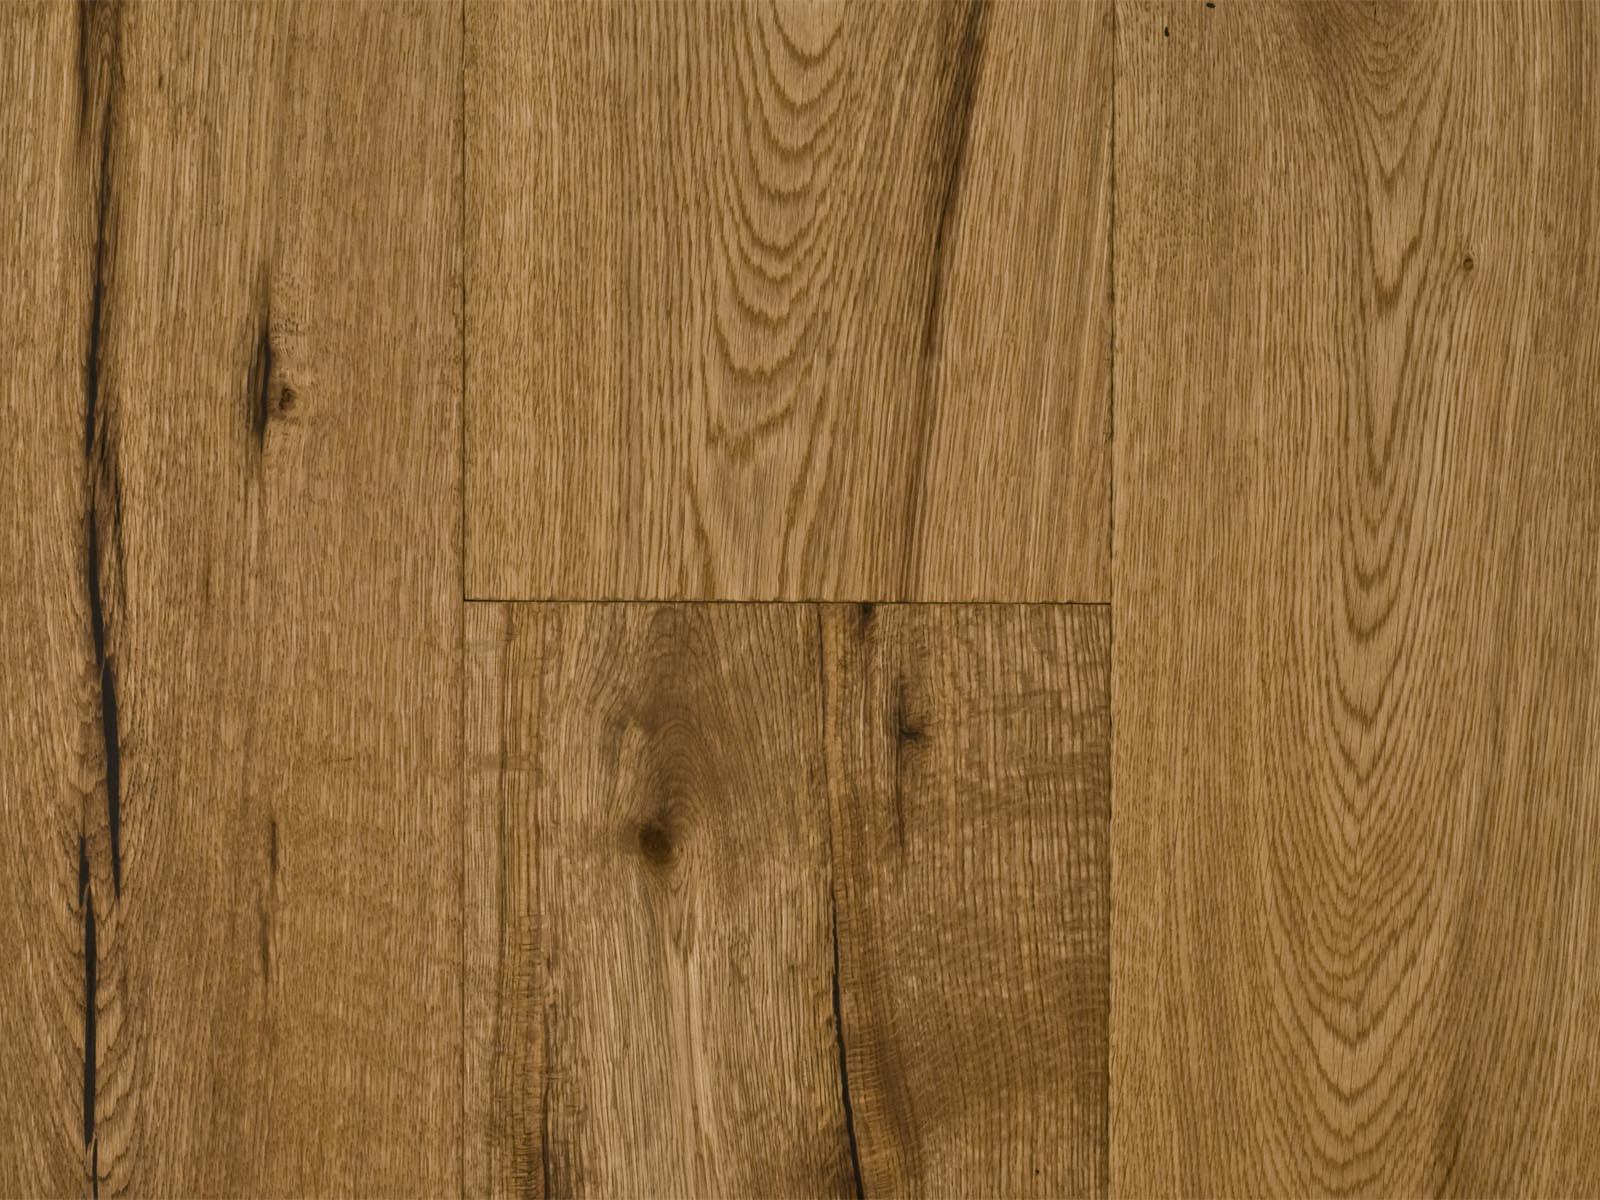 white oak hardwood flooring for sale of duchateau hardwood flooring houston tx discount engineered wood in antique white european oak